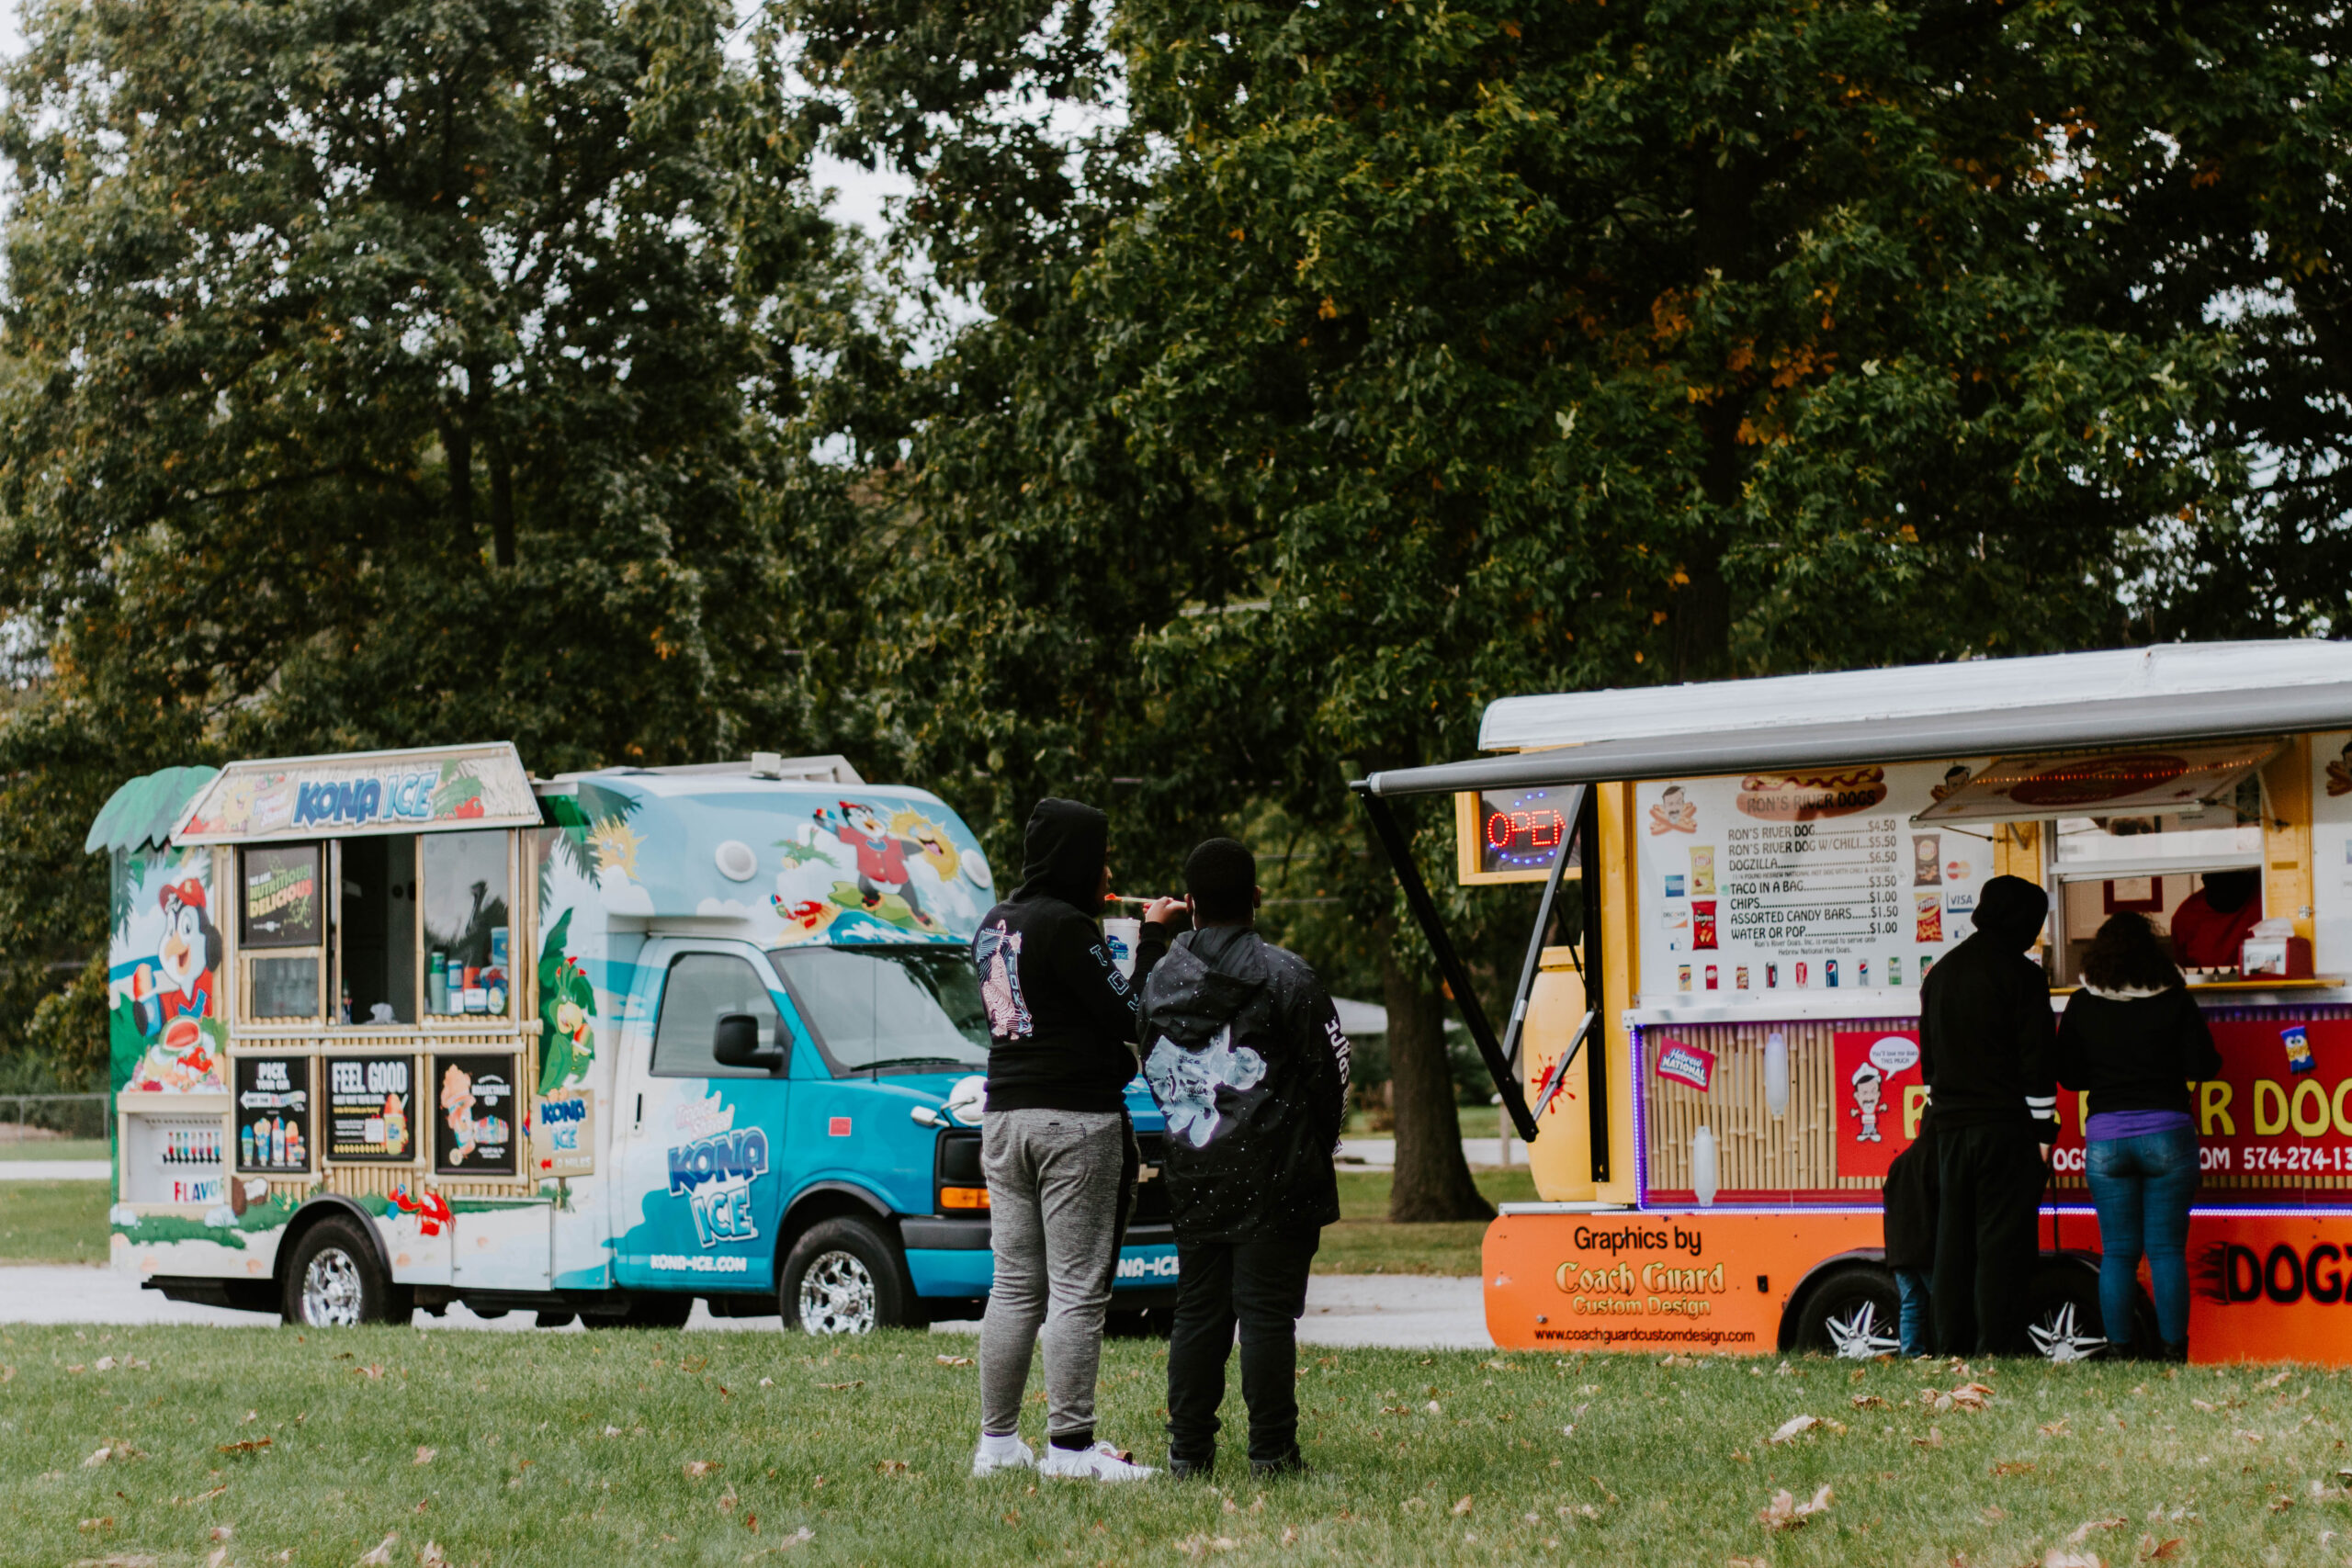 food trucks at event